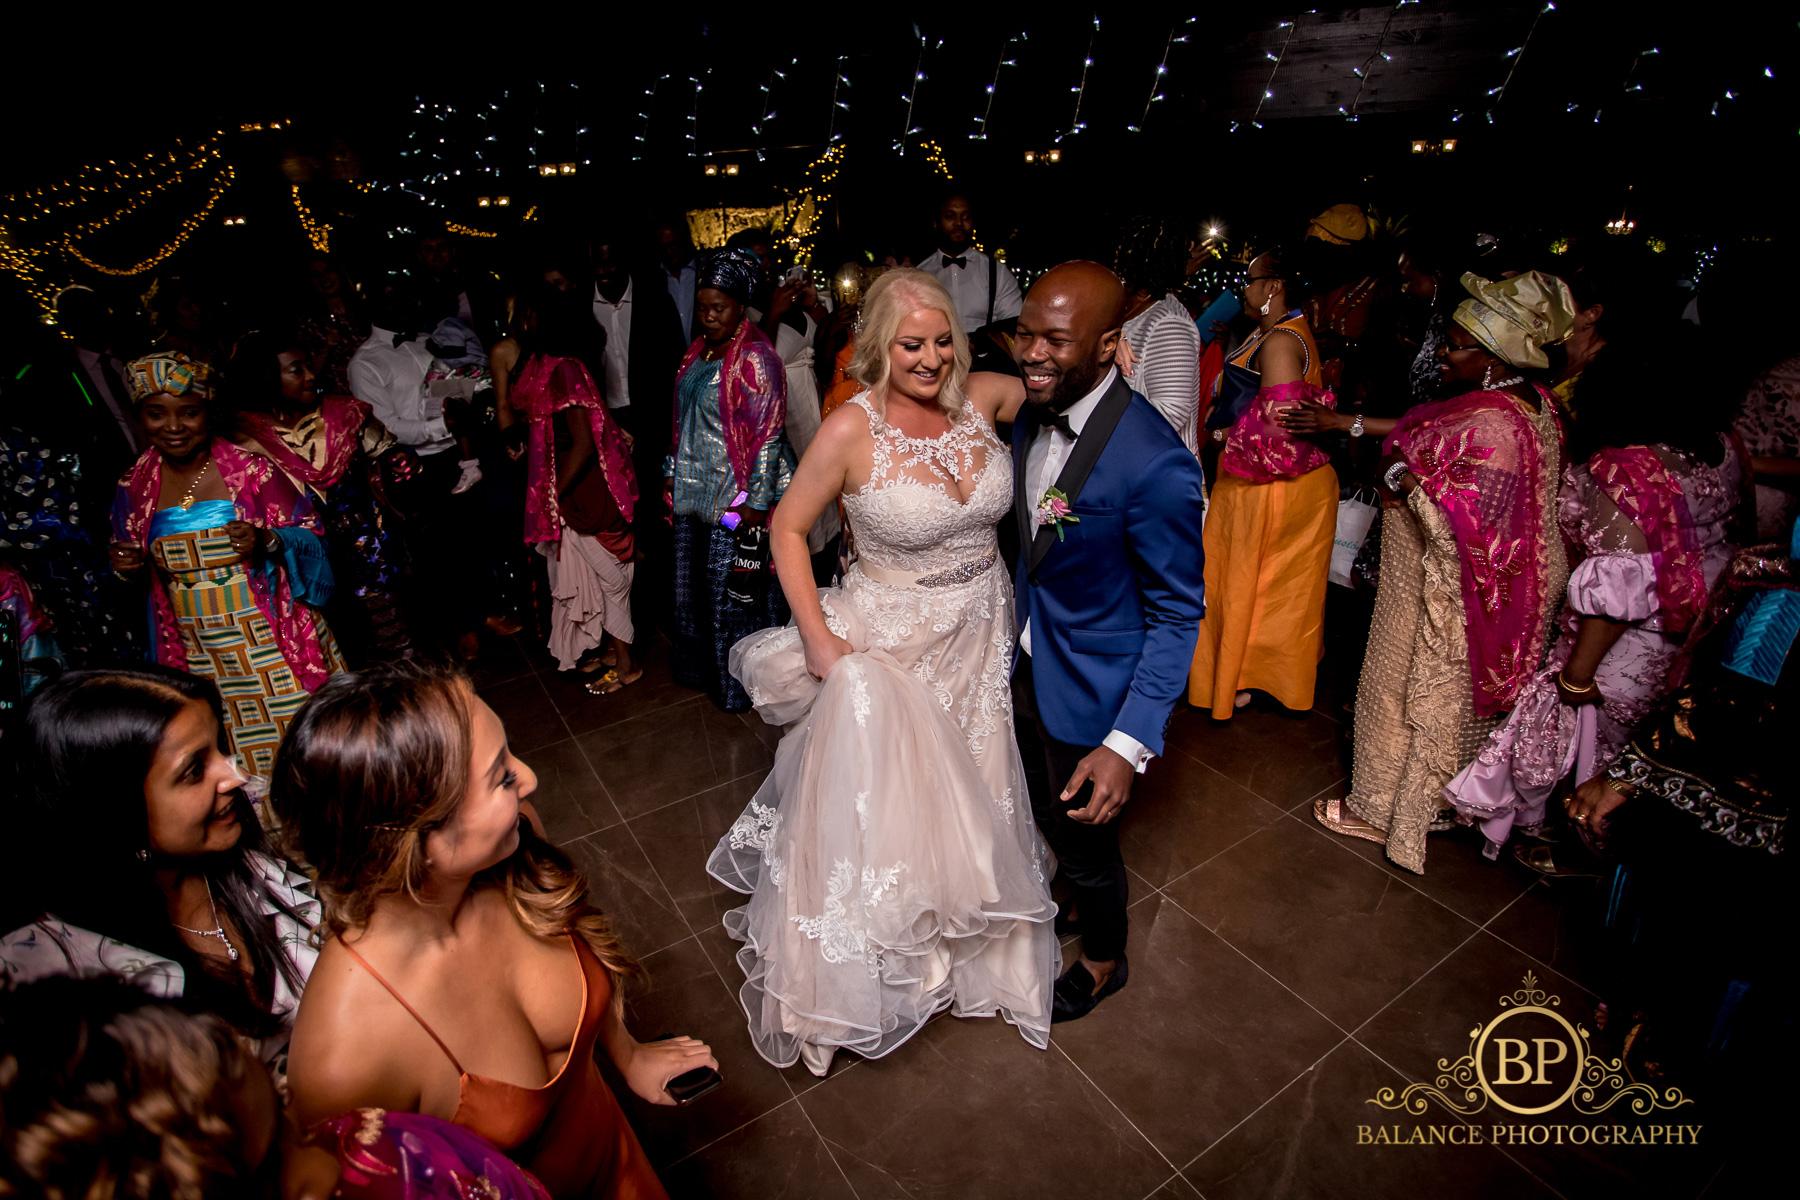 The bride and groom dance the night away - Balance Photography